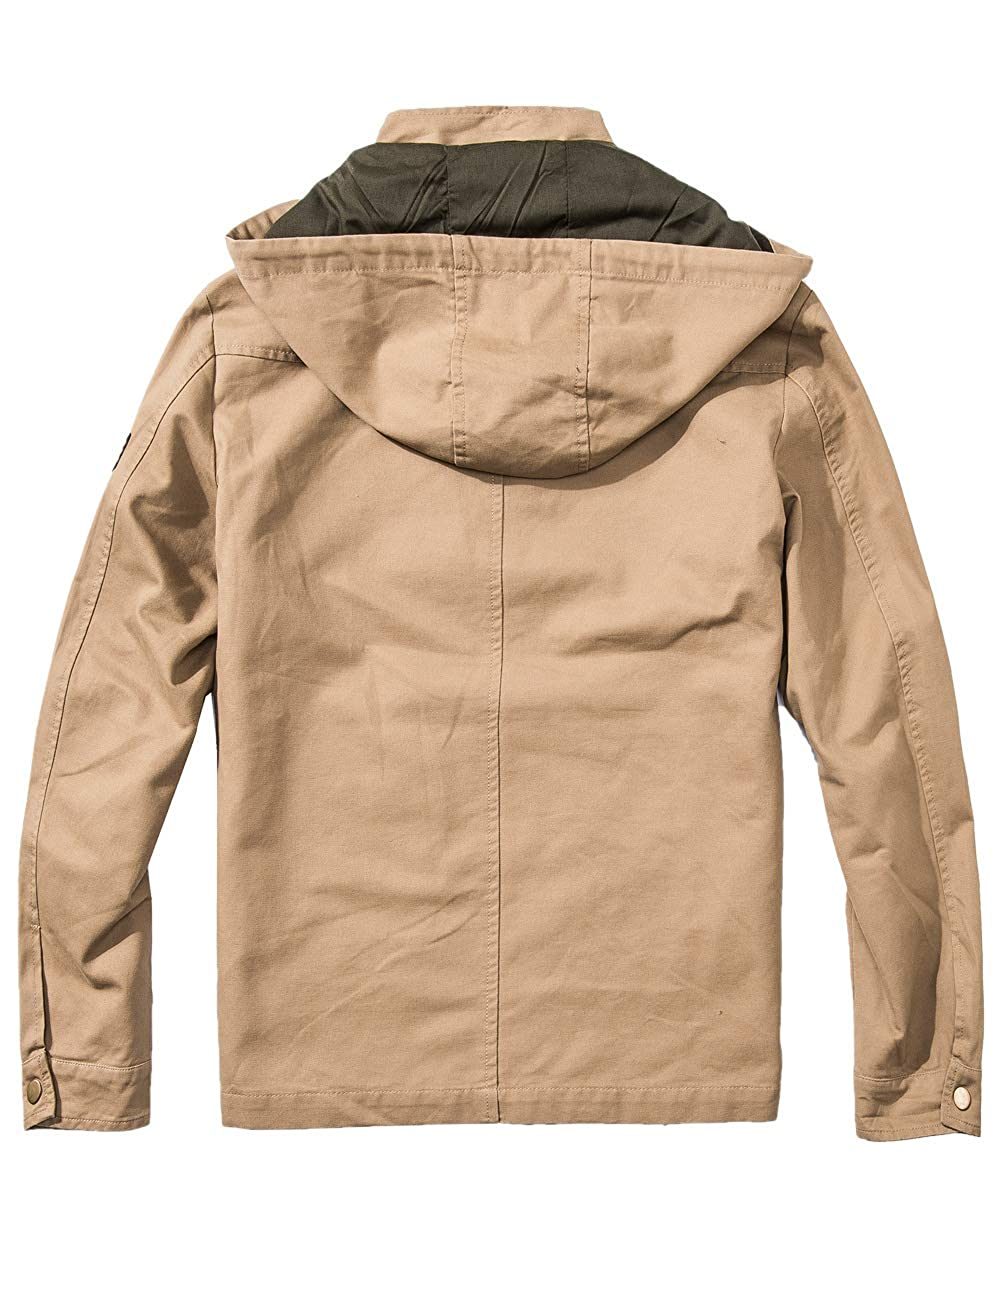 Mens Cotton Bomber Military Jacket Multi-Pocket Removable Hooded DYGH-JK2601